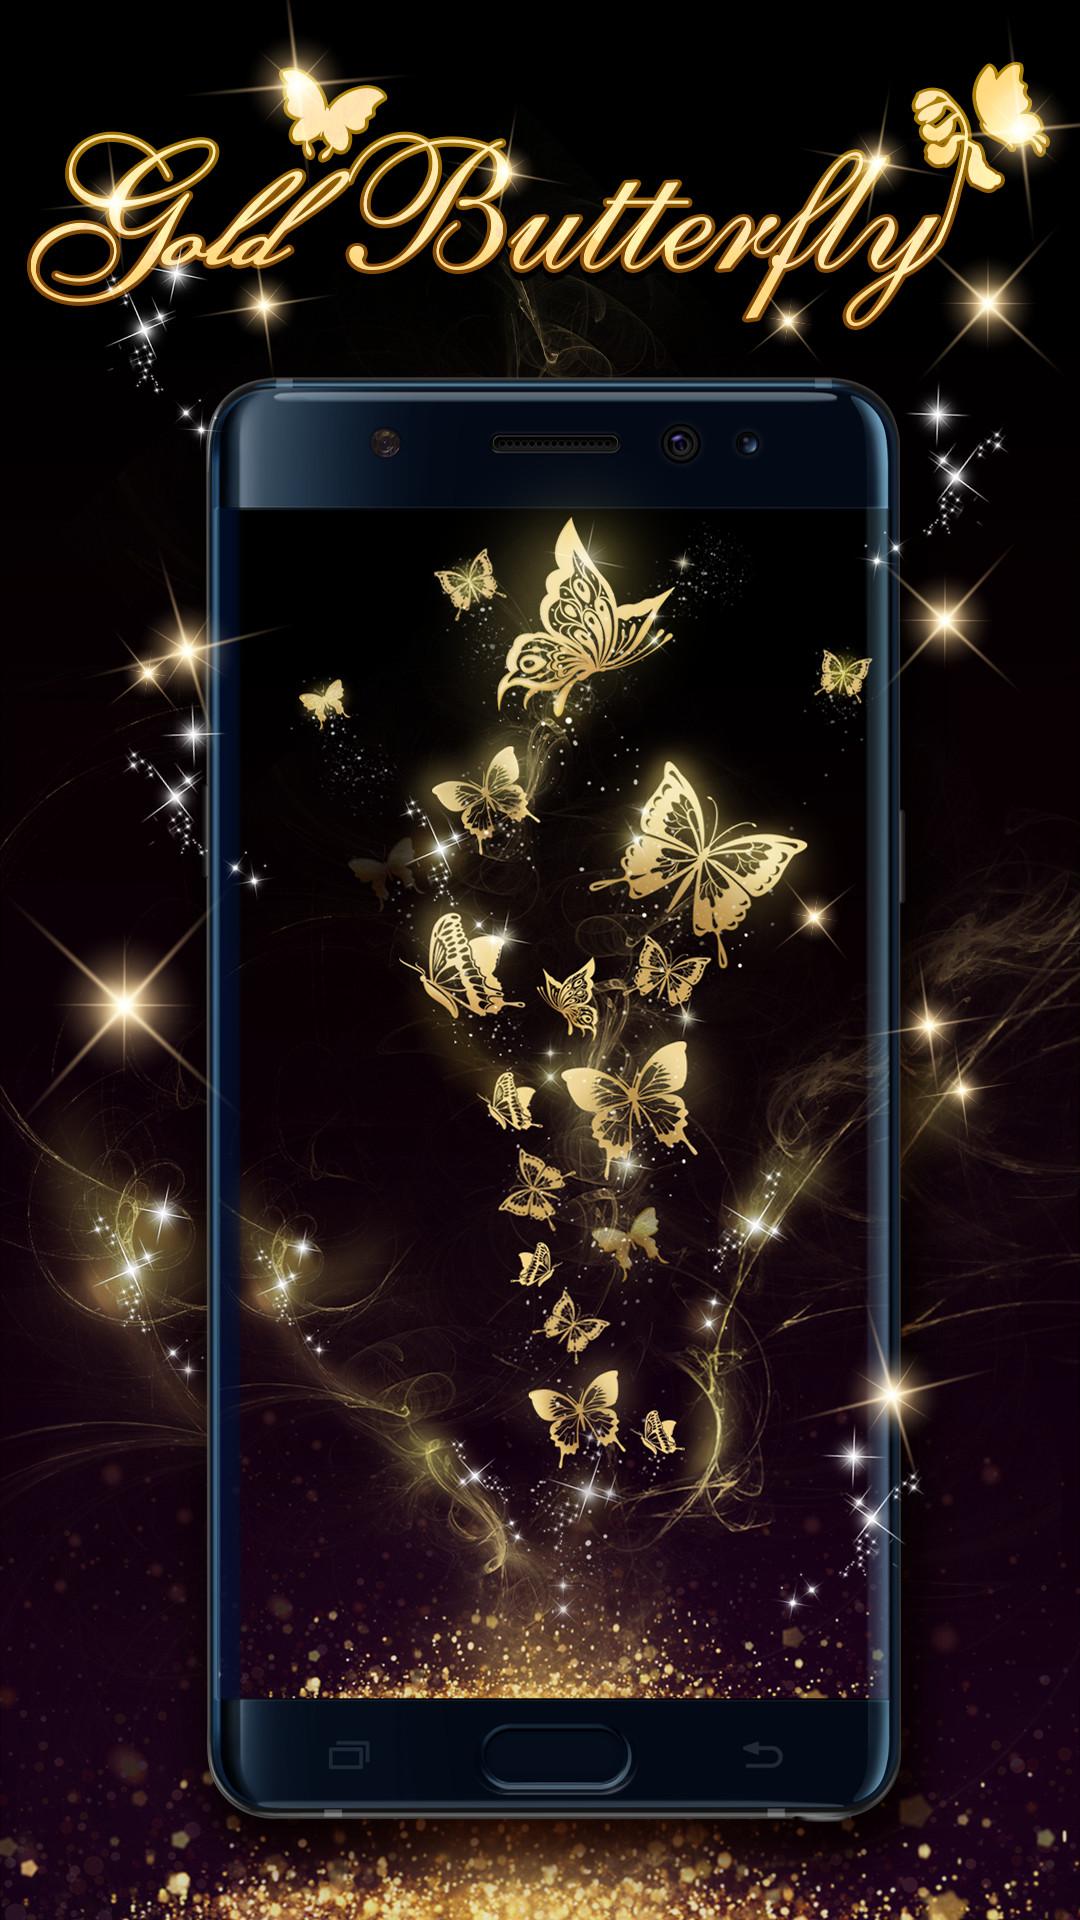 Gold butterfly live wallpaper!